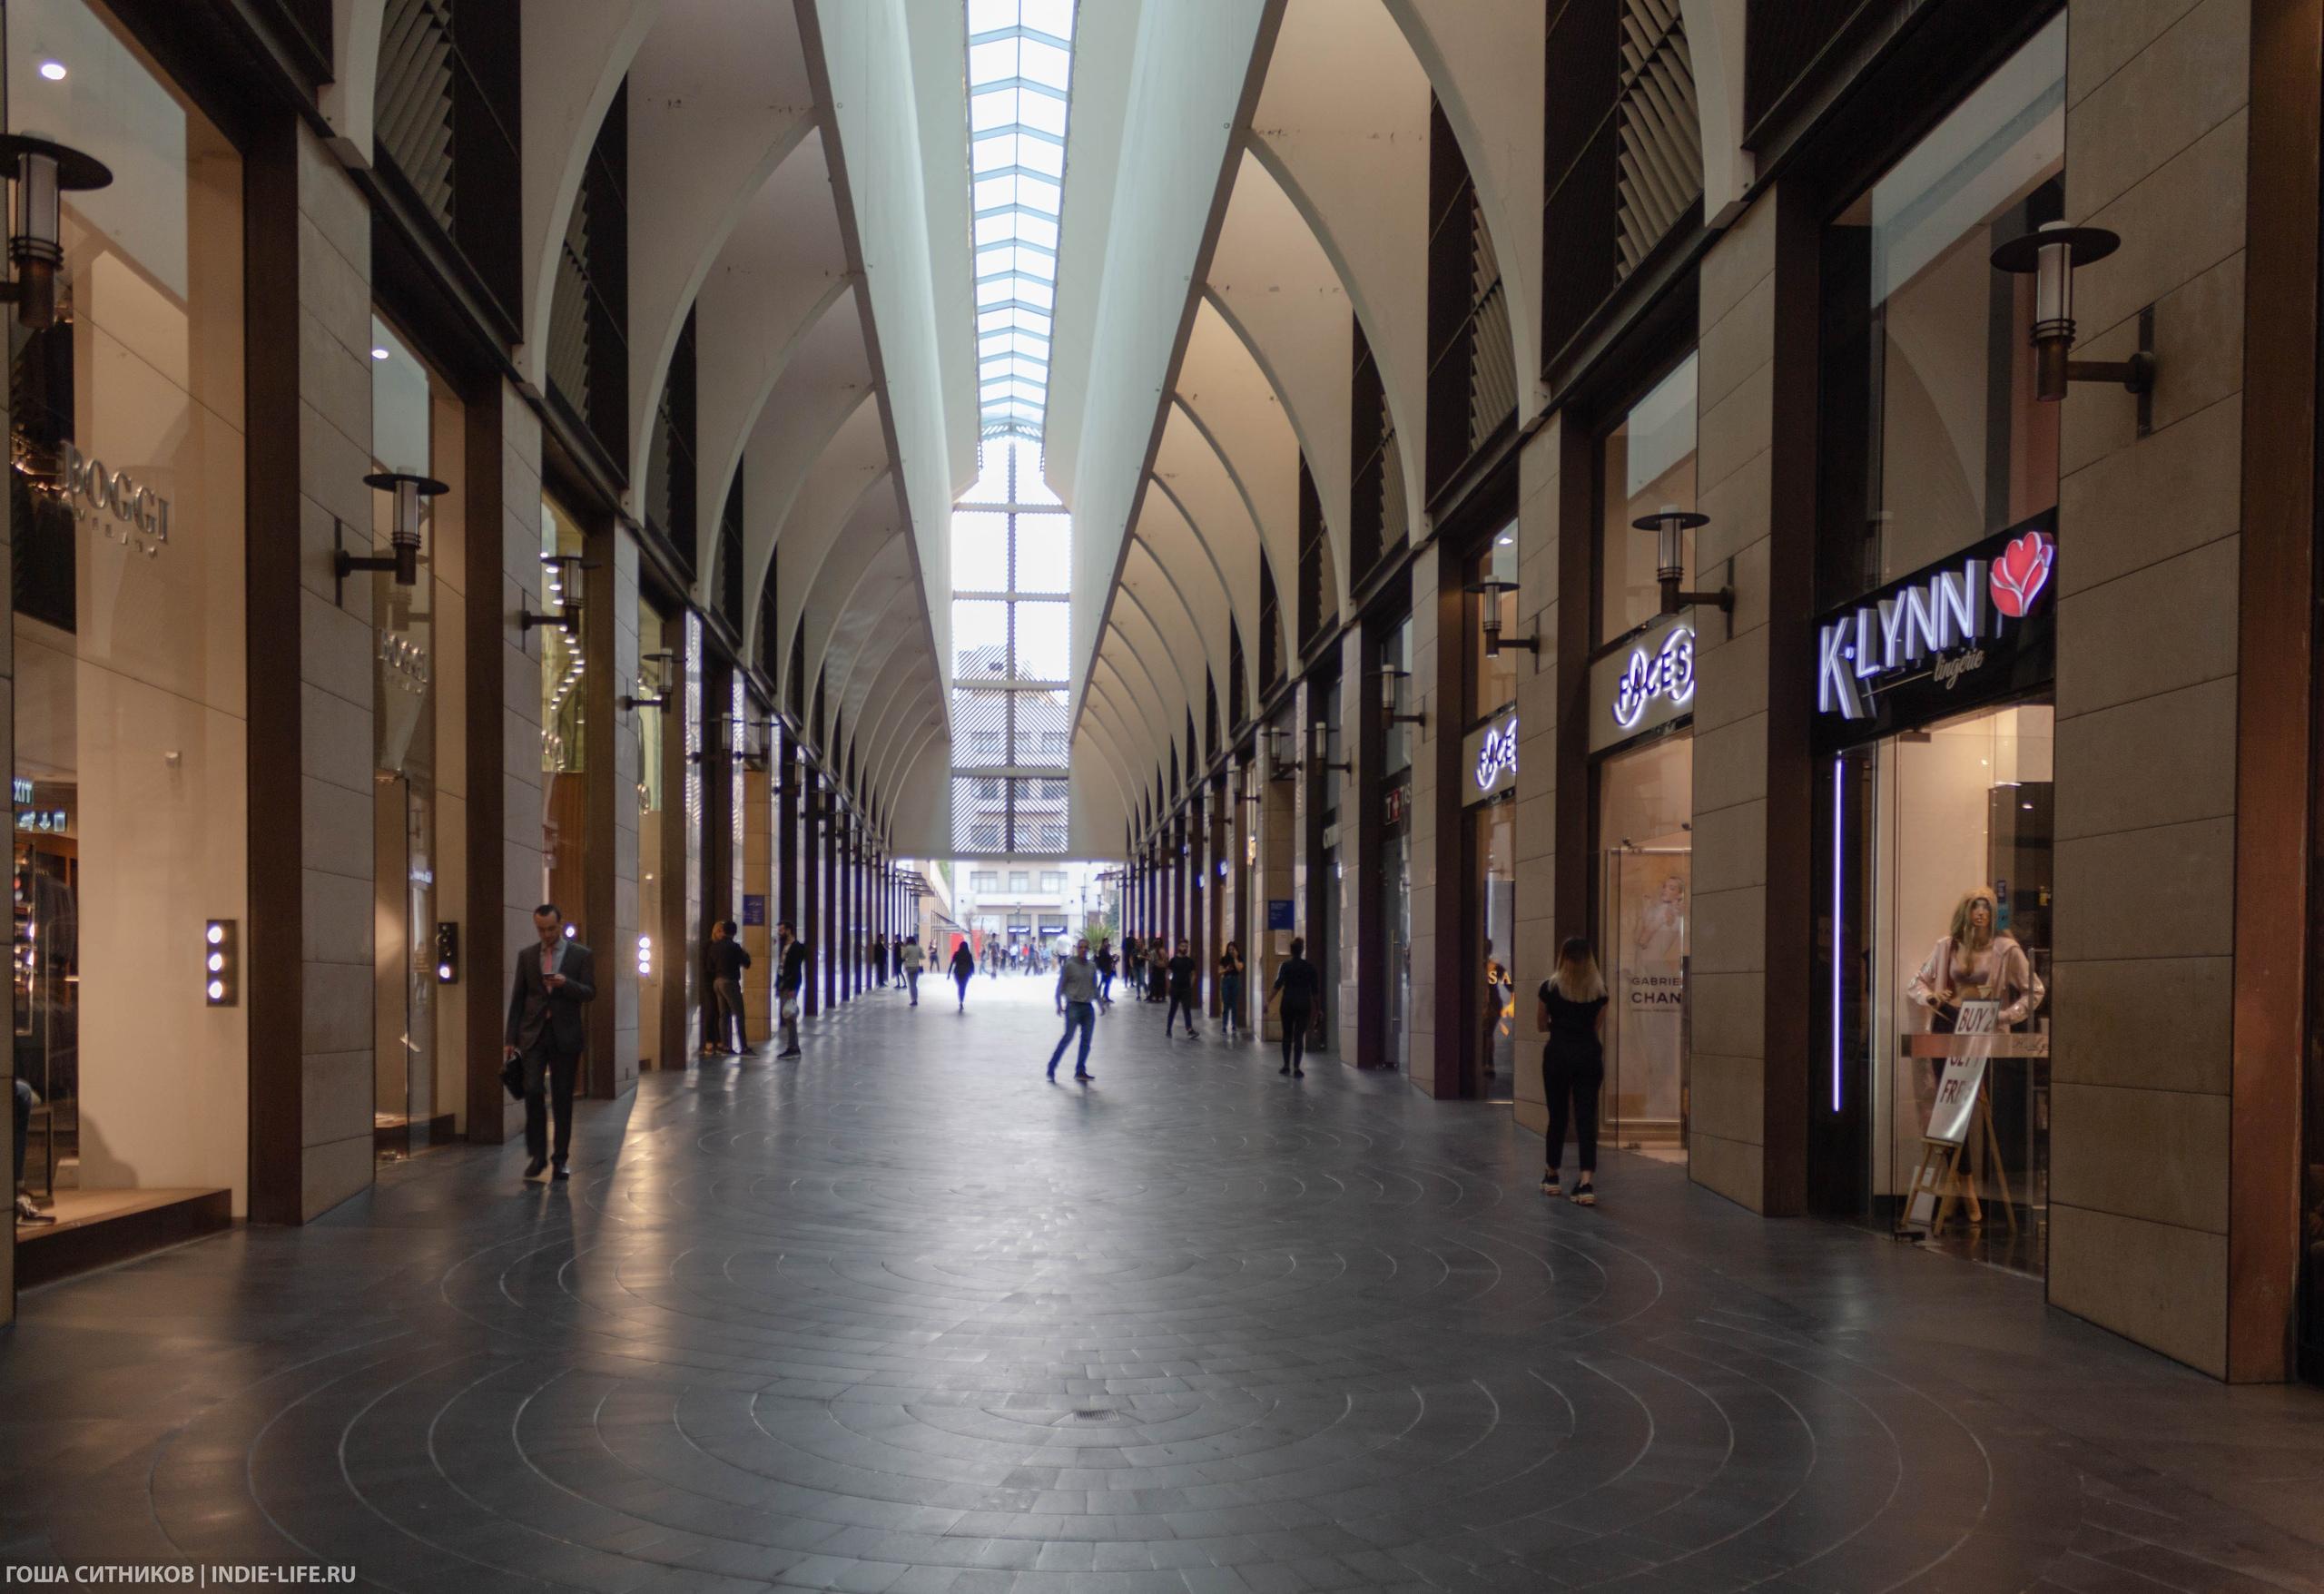 Бейрут. Торговый центр